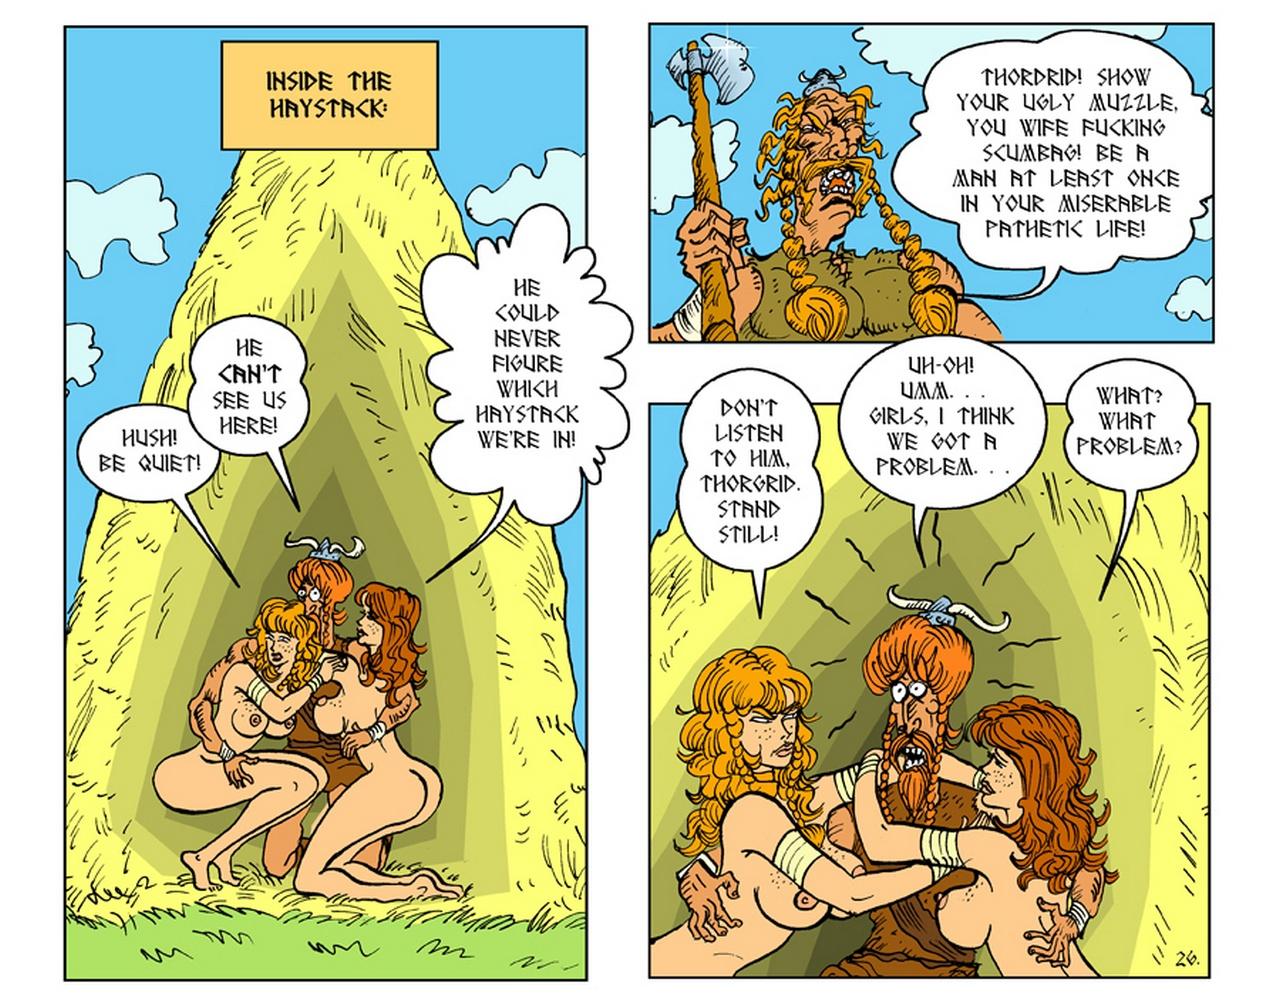 Horny Saga 2 - part 2